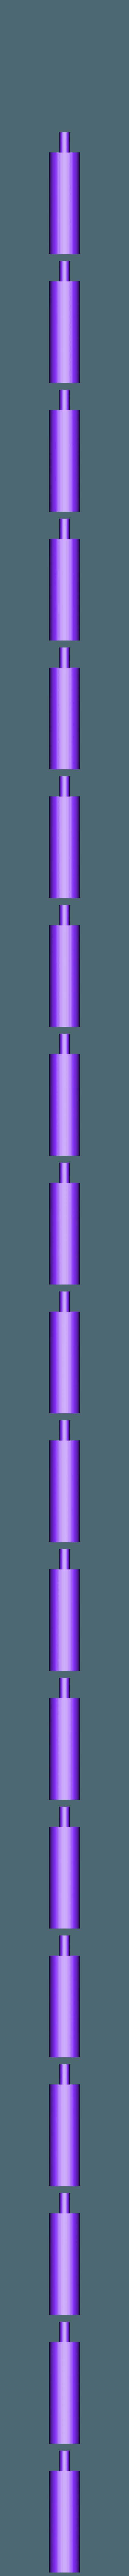 Handle:Grip Bottom.stl Download free STL file 3D Long Sword • 3D print template, Logtrimmer